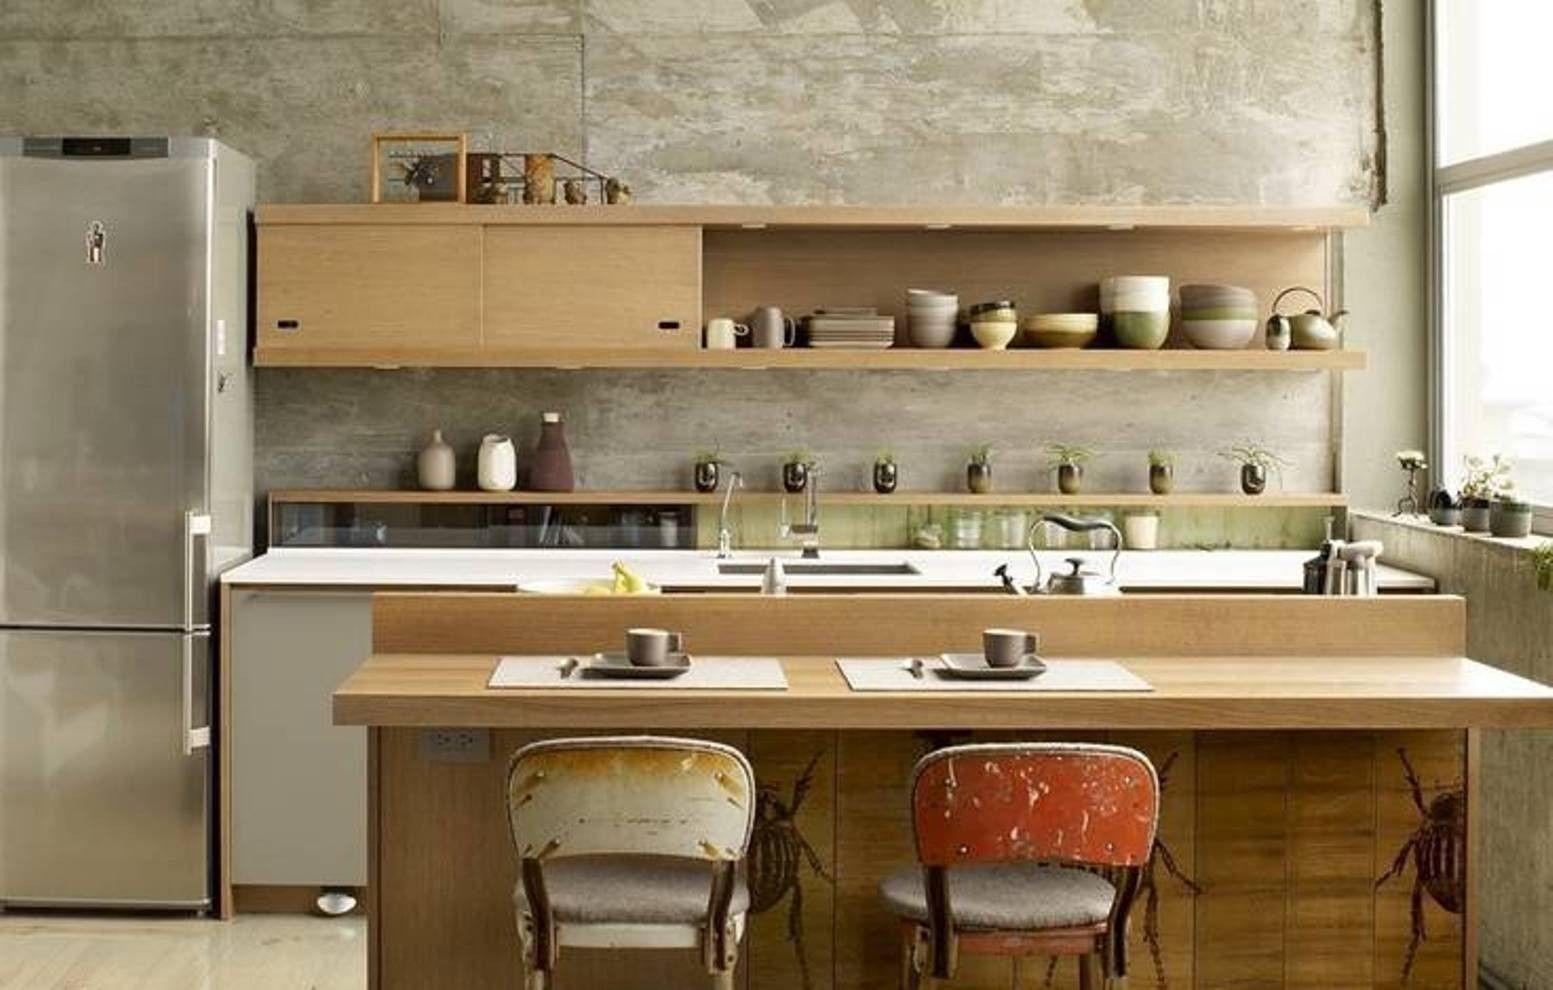 redecorating kitchen ideas japanese interior design interior design kitchen modern kitchen on kitchen interior japan id=65103